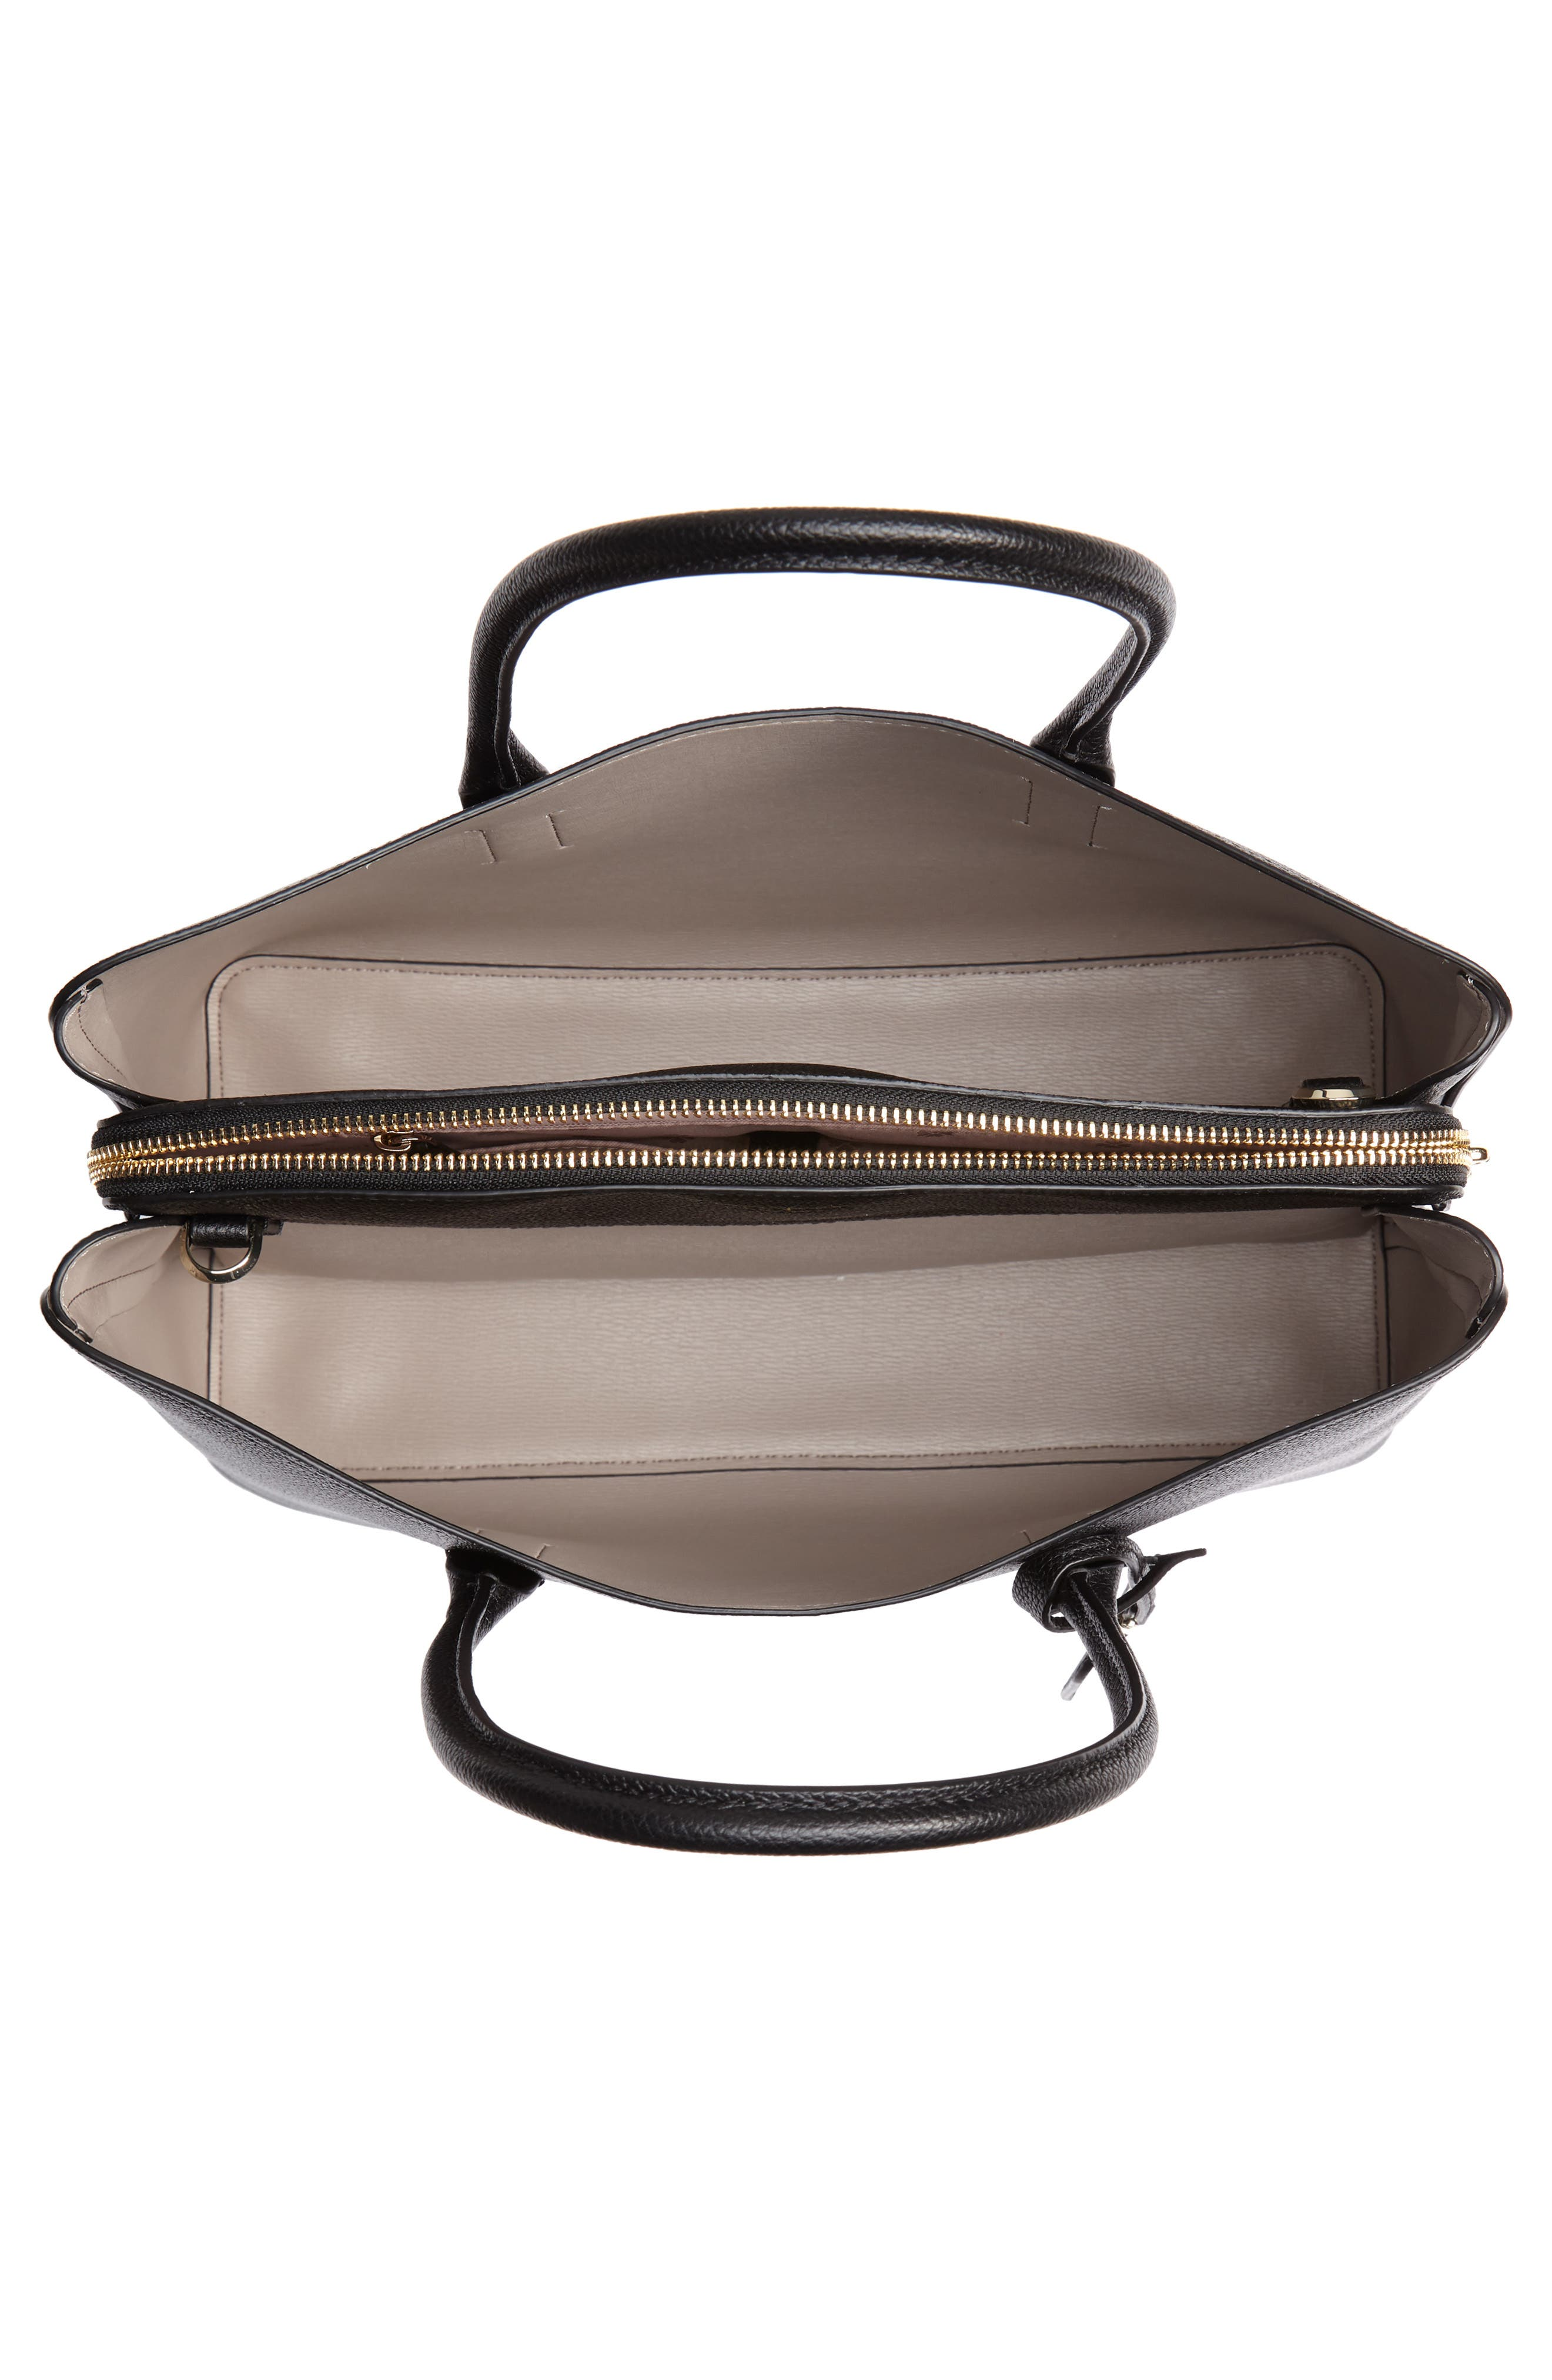 KATE SPADE NEW YORK,                             large margaux leather satchel,                             Alternate thumbnail 4, color,                             BLACK